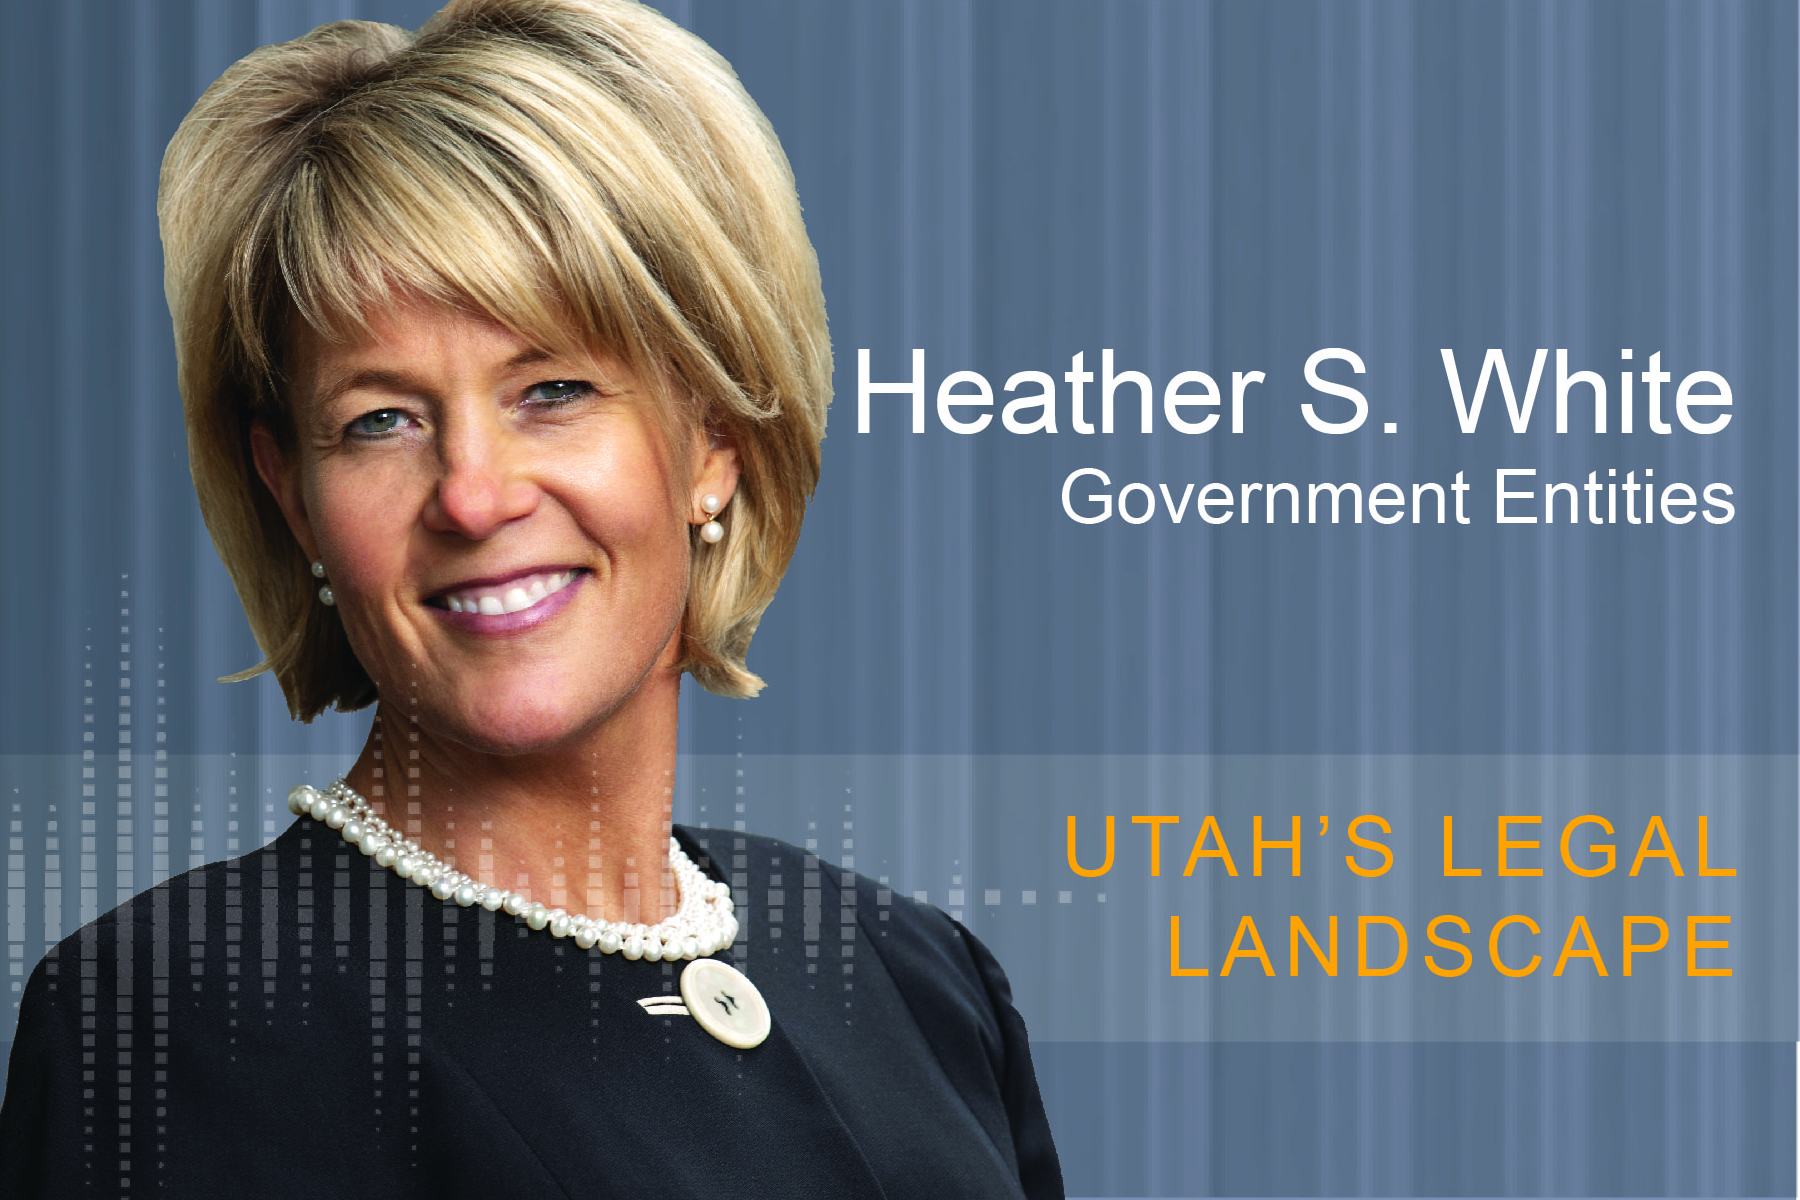 Utah's Legal Landscape Podcast Cover - Heather White